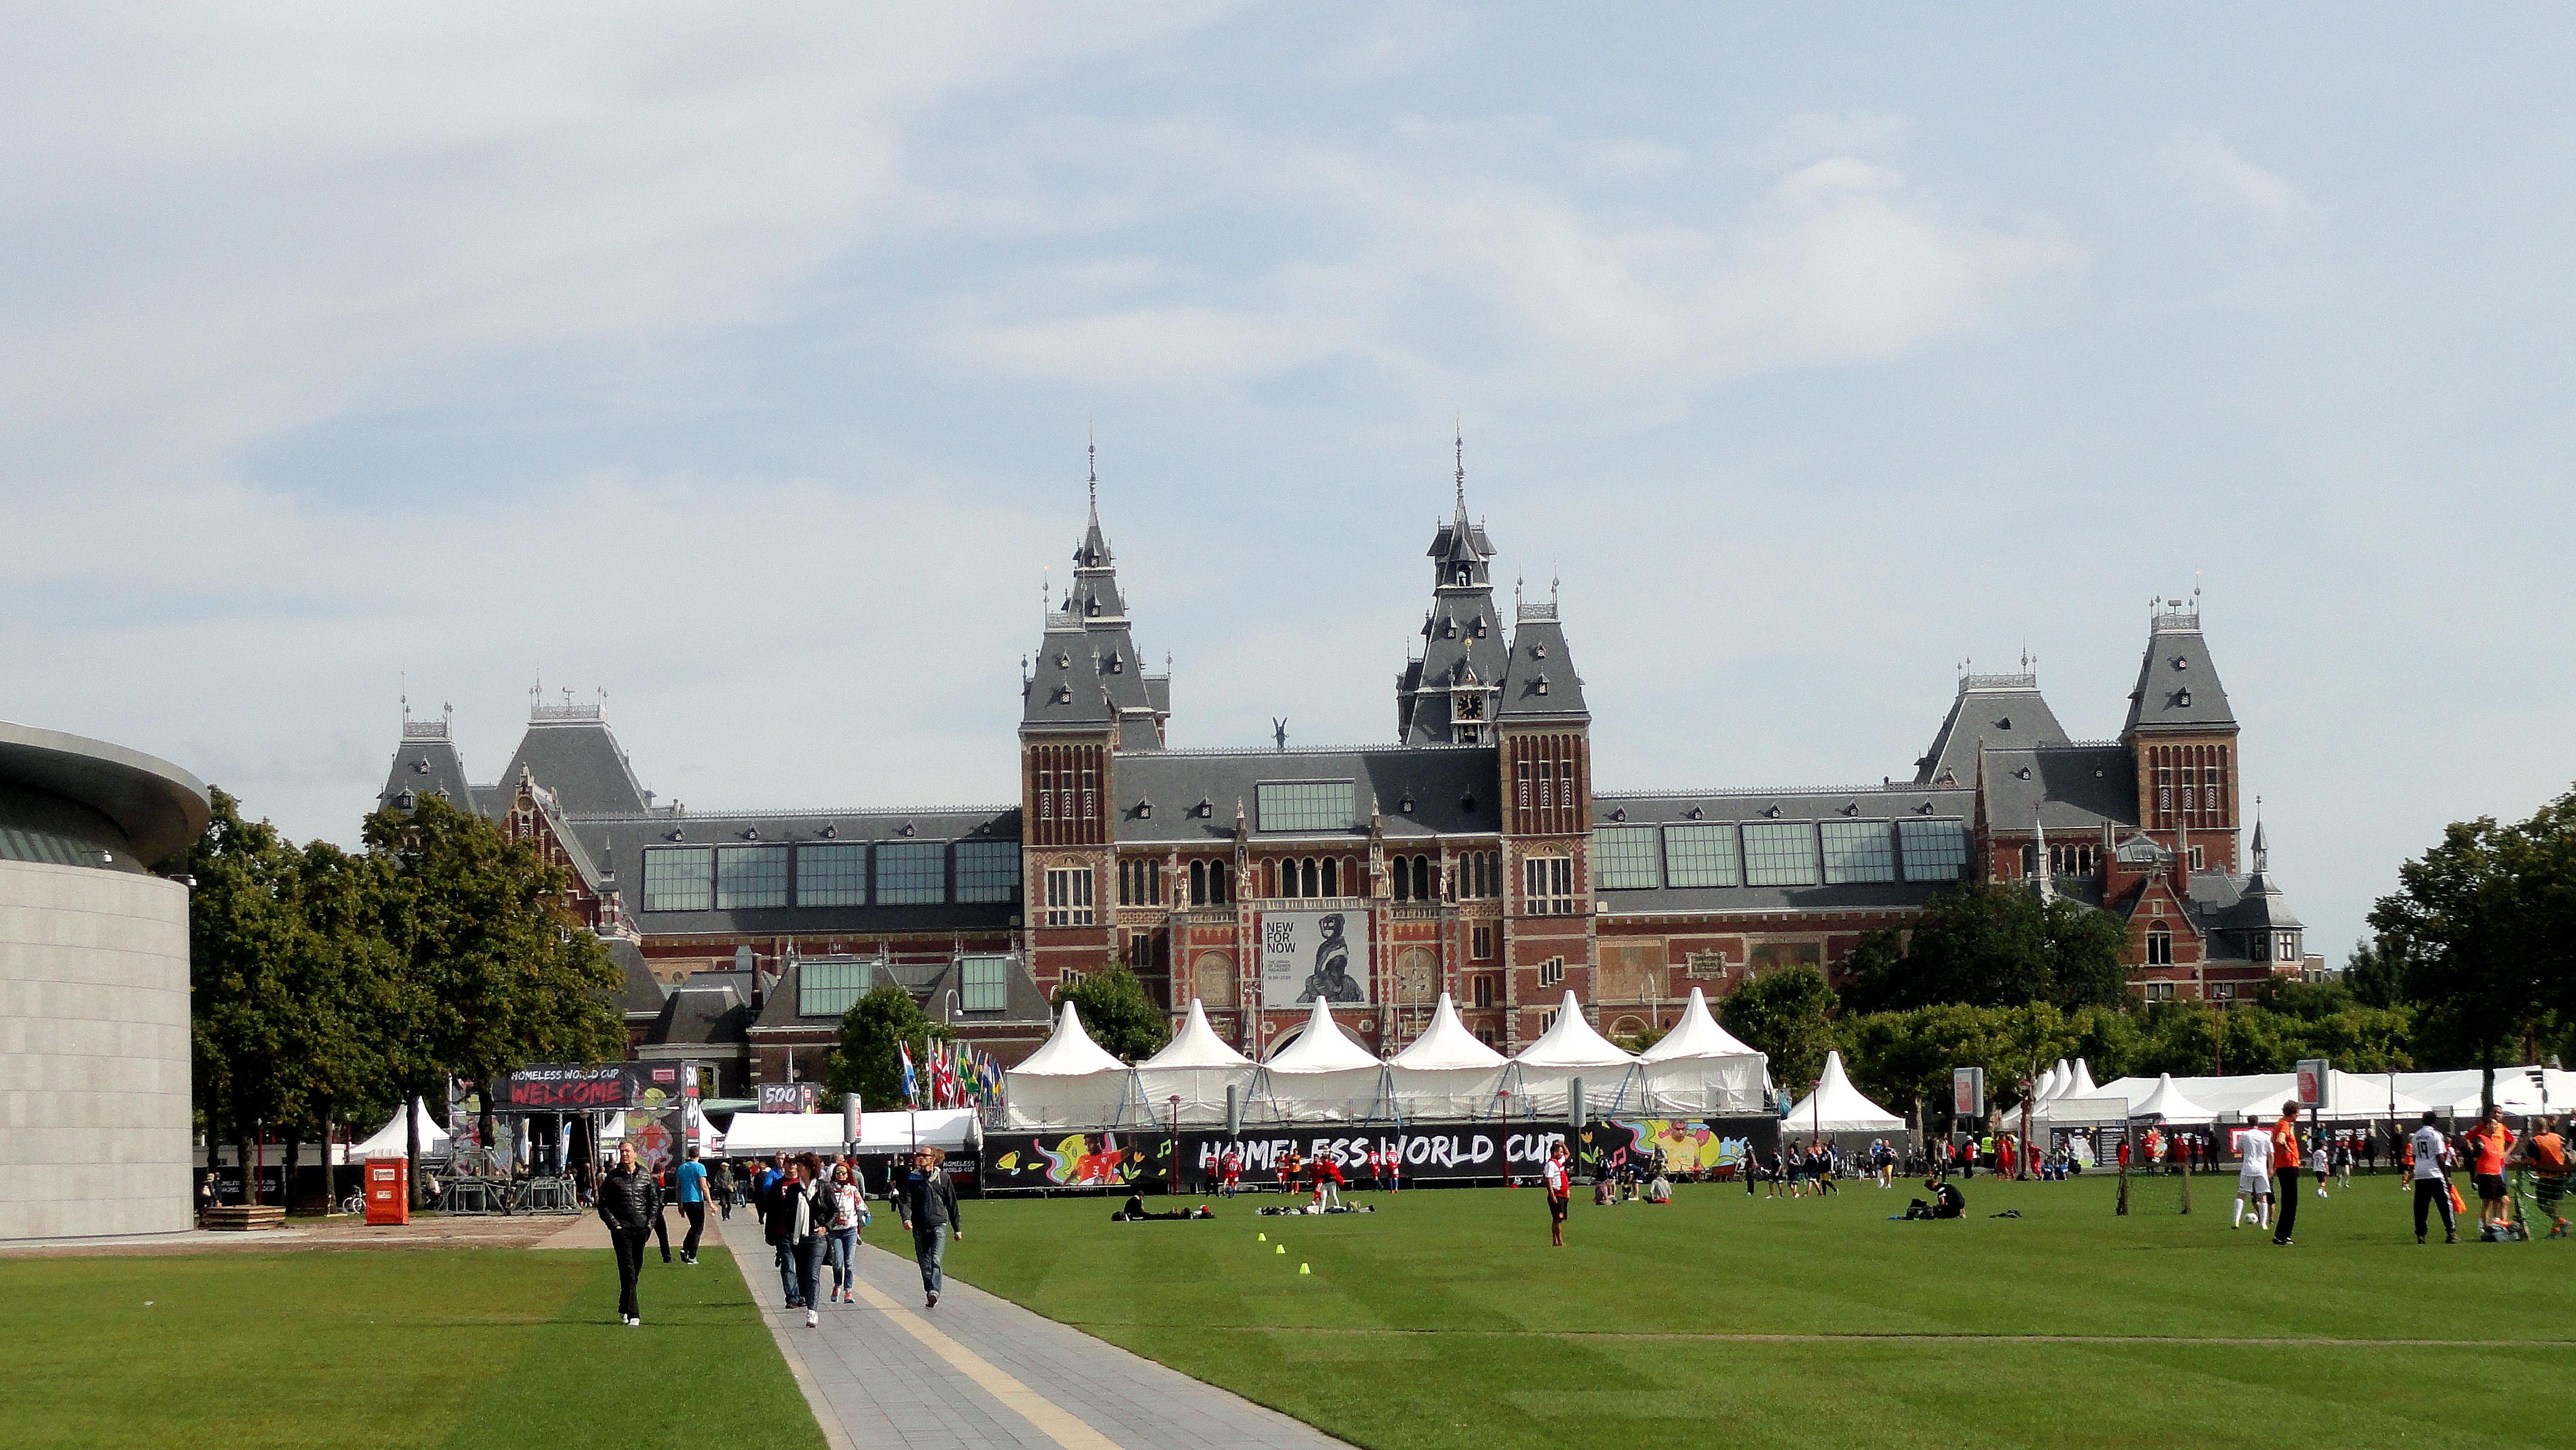 Museumplein - 155 Photos & 36 Reviews - Landmarks & Historical ...